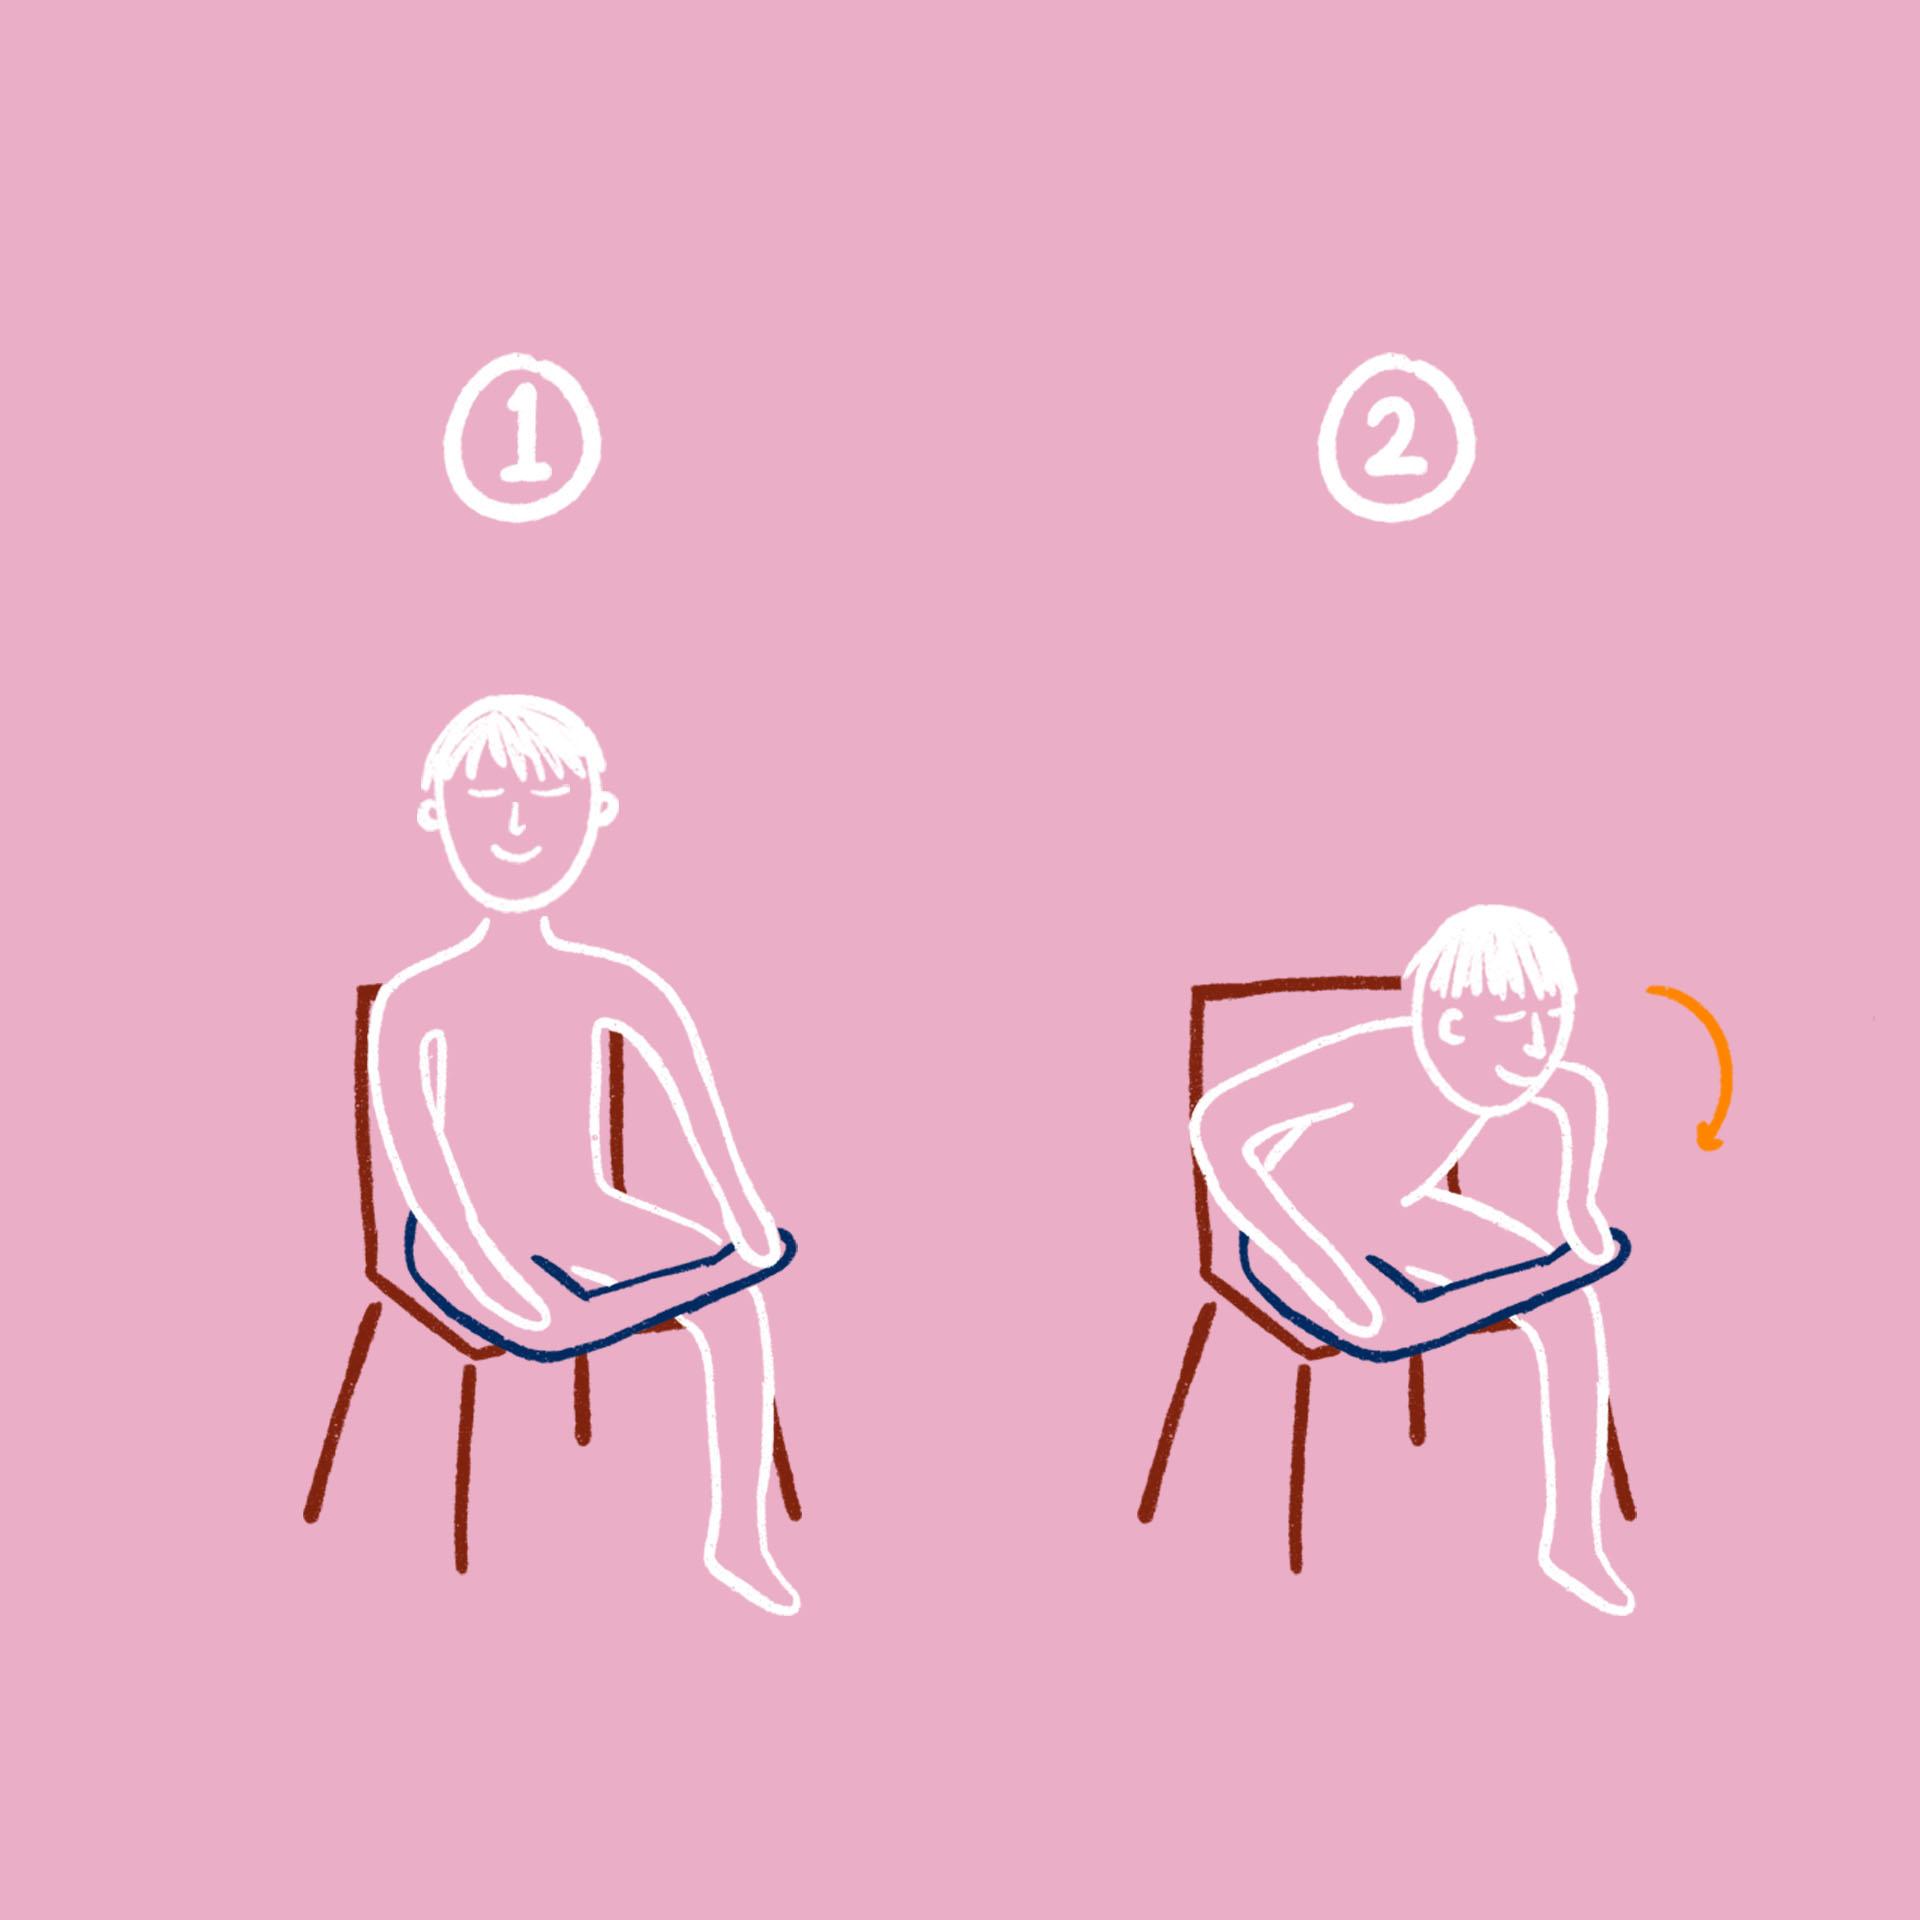 stretch-illustrations_v03b06-seated pigeon.jpg